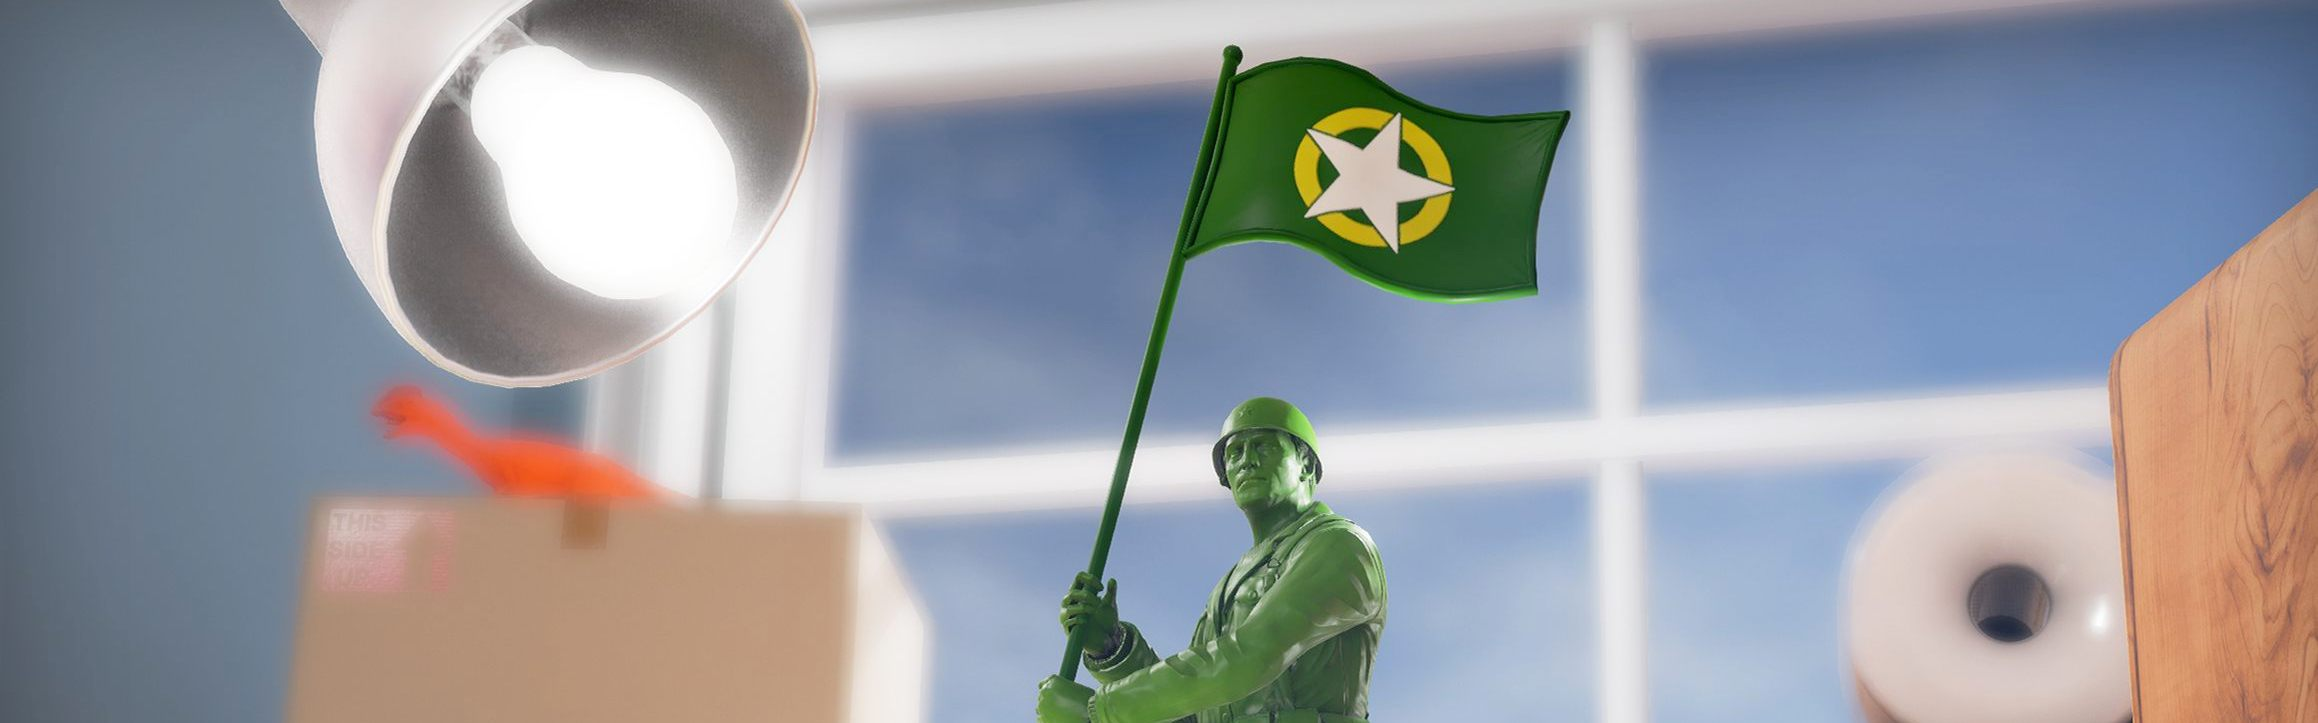 The Mean Greens - Plastic Warfare Steam Key GLOBAL